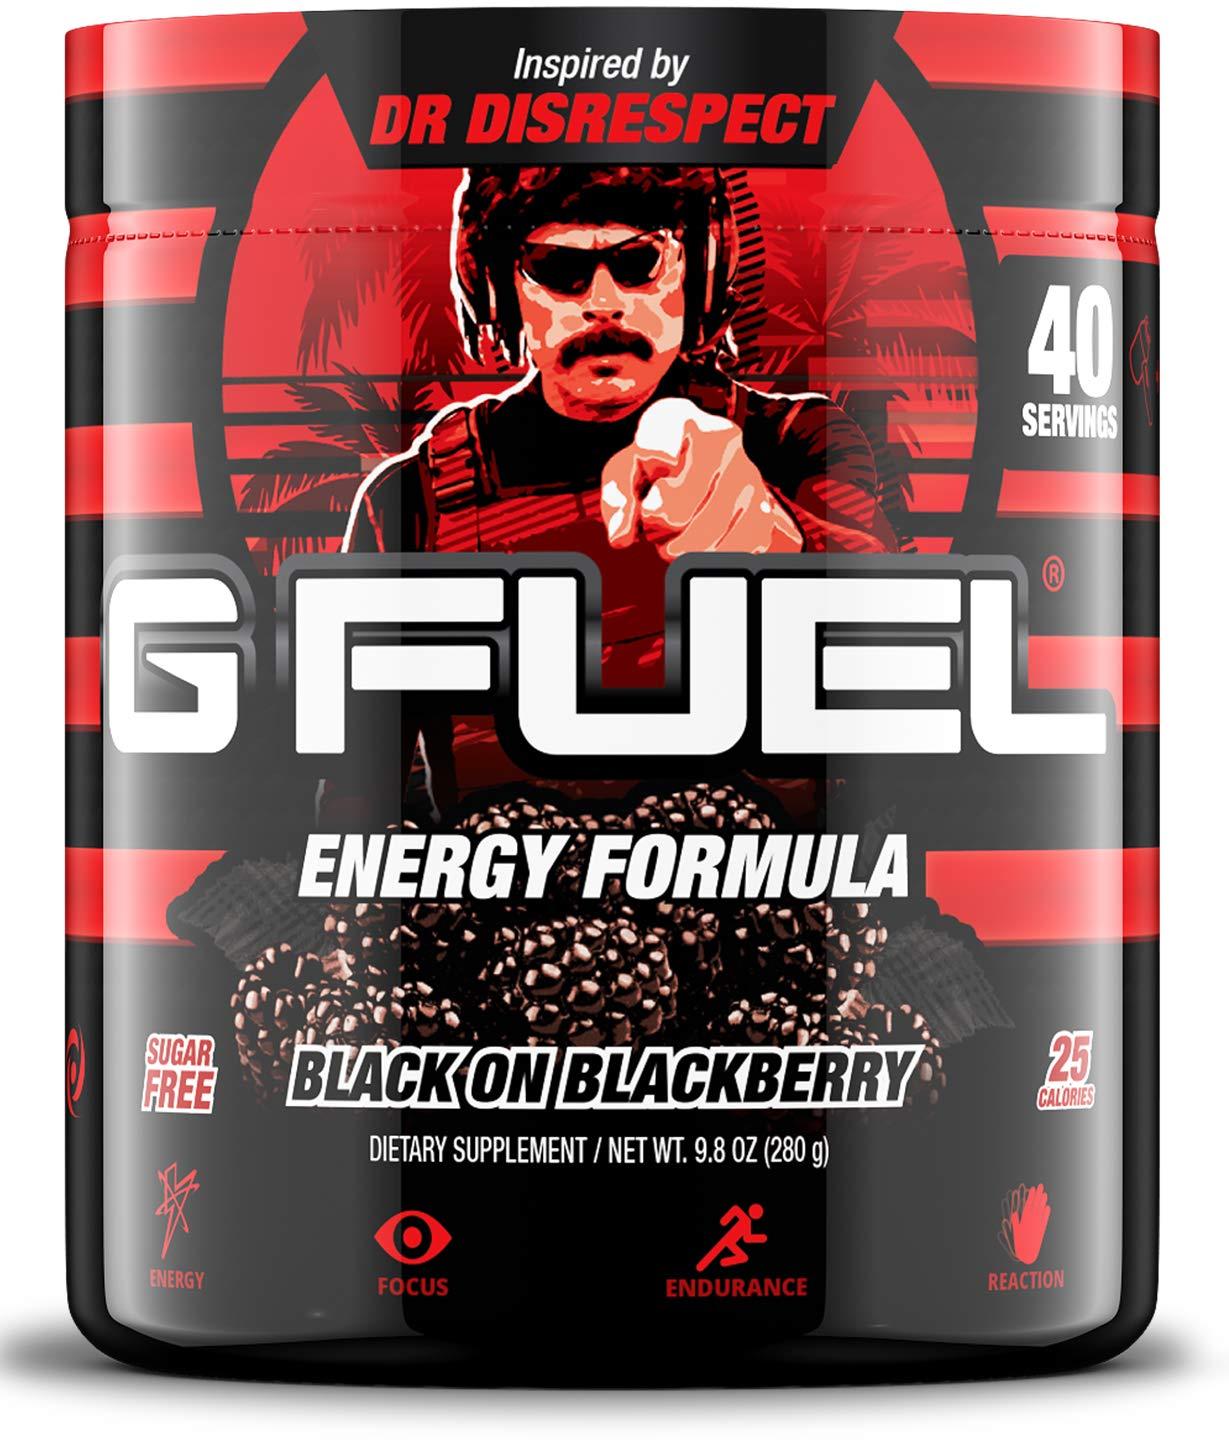 G Fuel Black on BlackBerry Tub (40 Servings) Elite Energy and Endurance Formula Inspired by Dr Disrespect